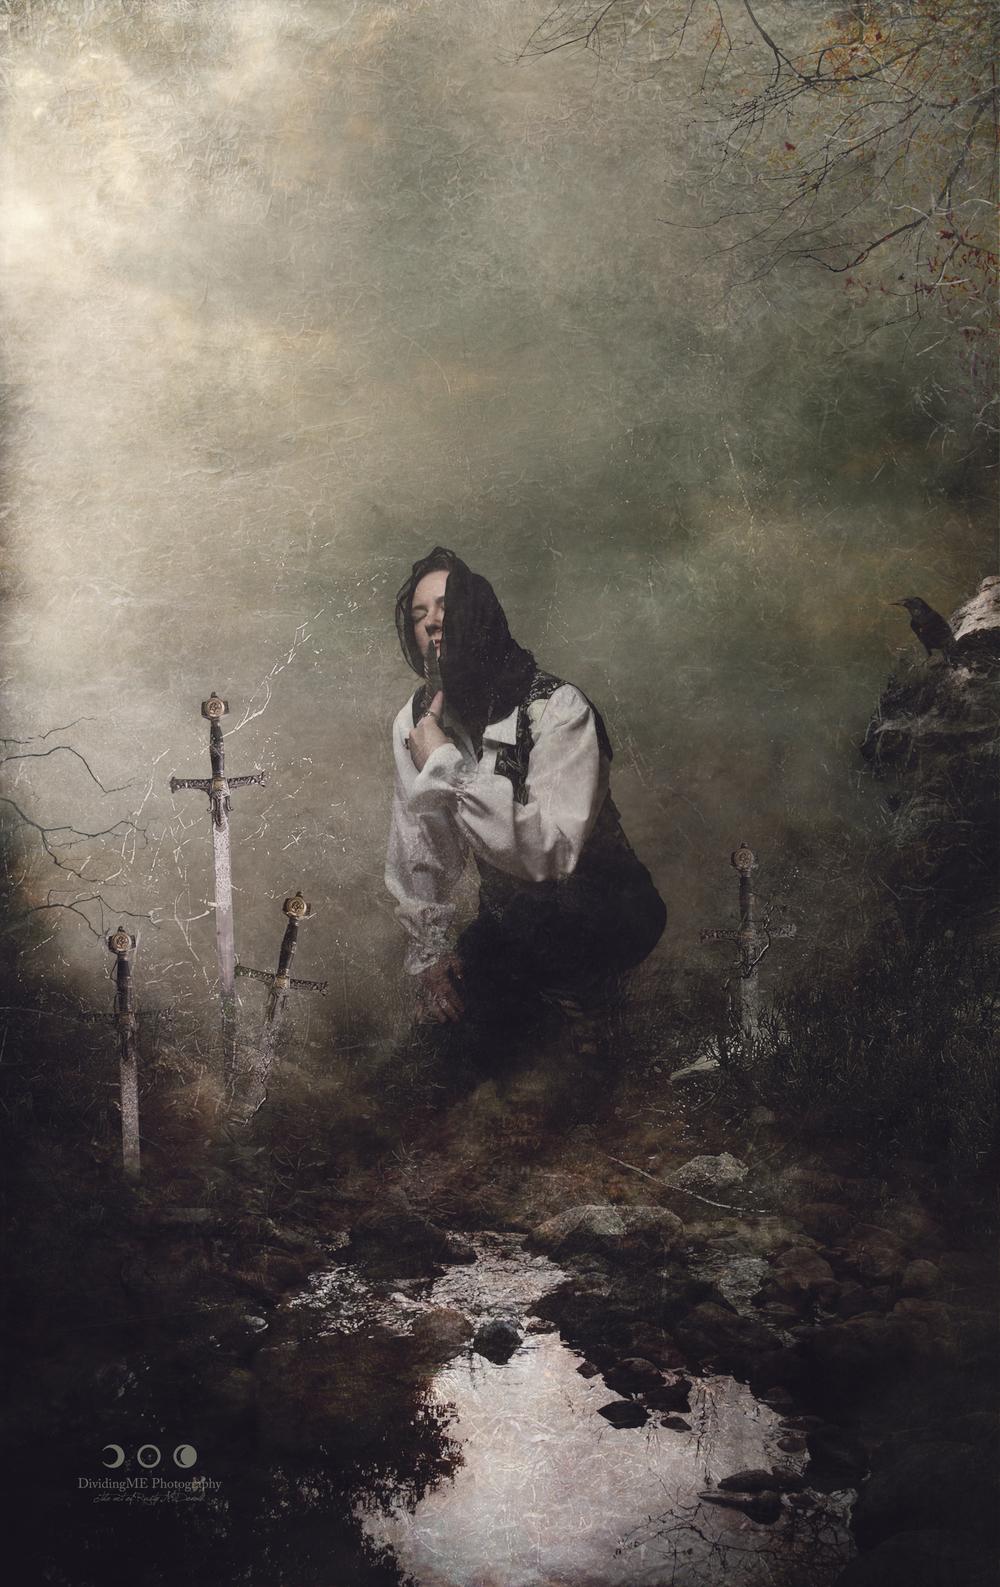 Michelle Belanger - Four of Swords